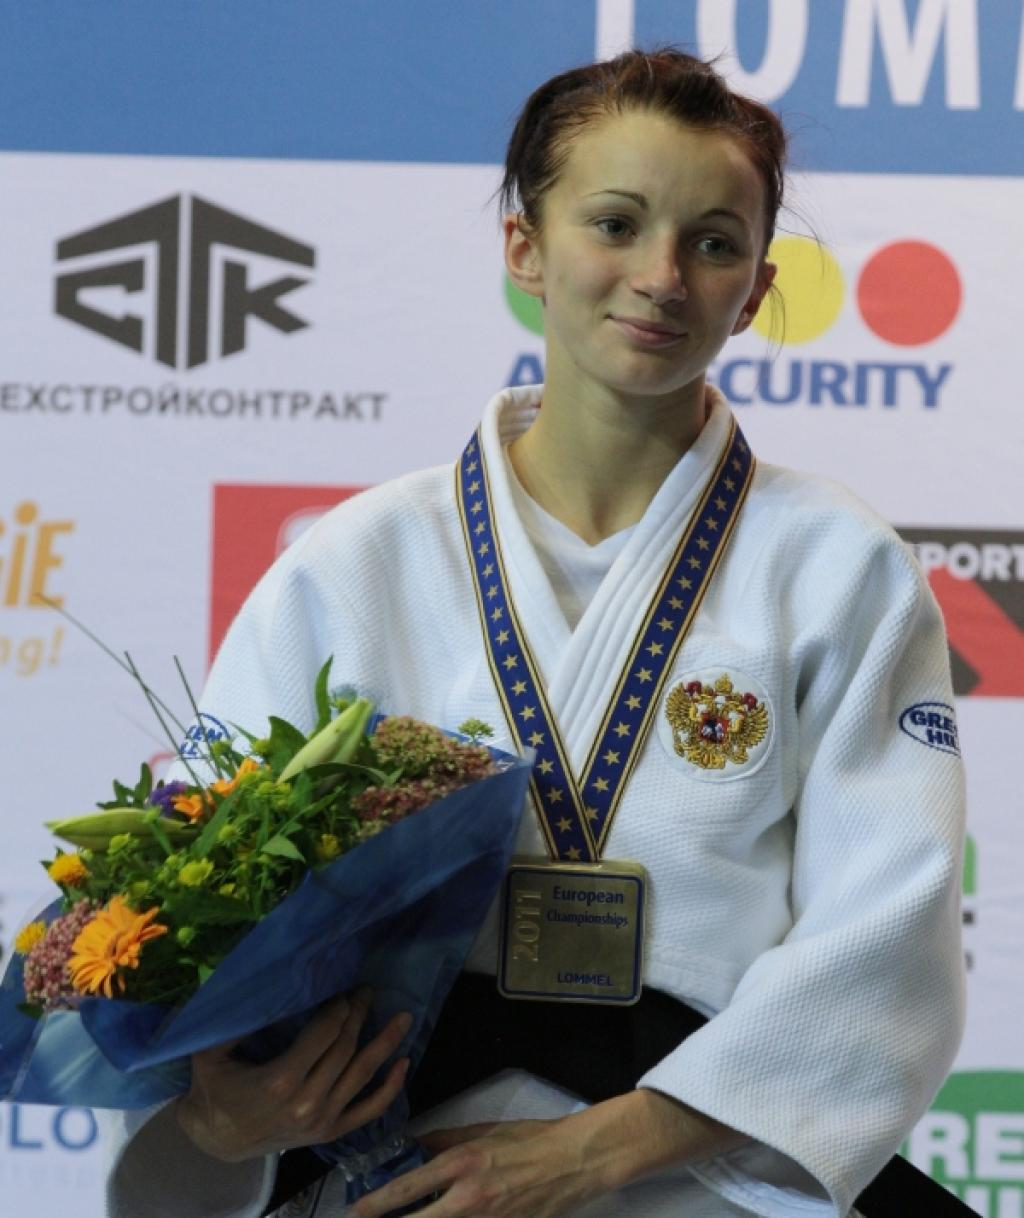 Oleksandra Demintseva wins second European title